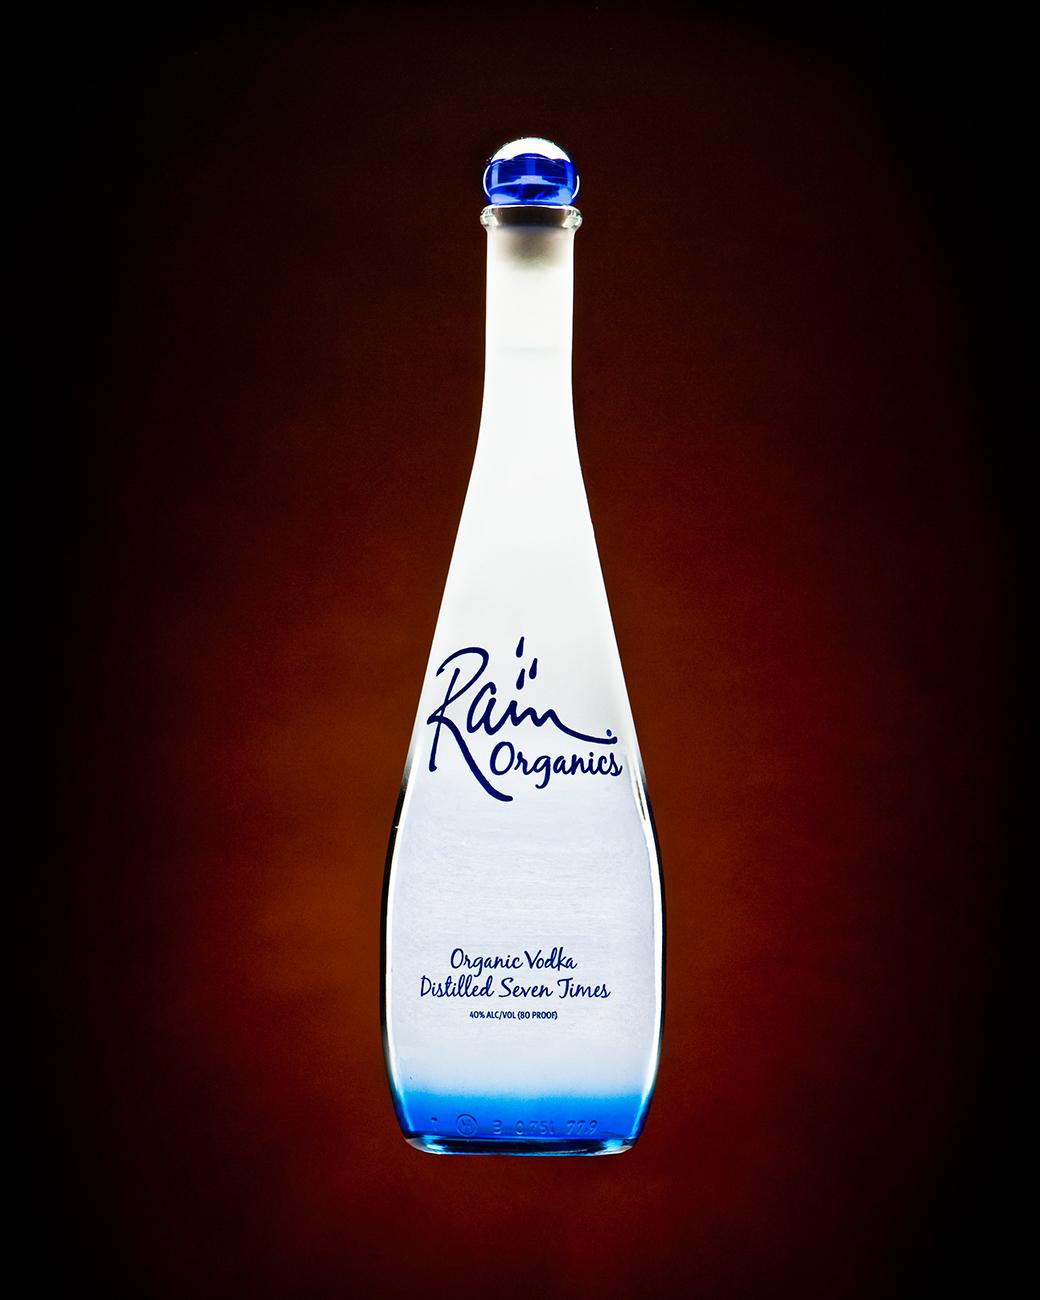 Rain Organics Vodka © Shawn Collie Photography